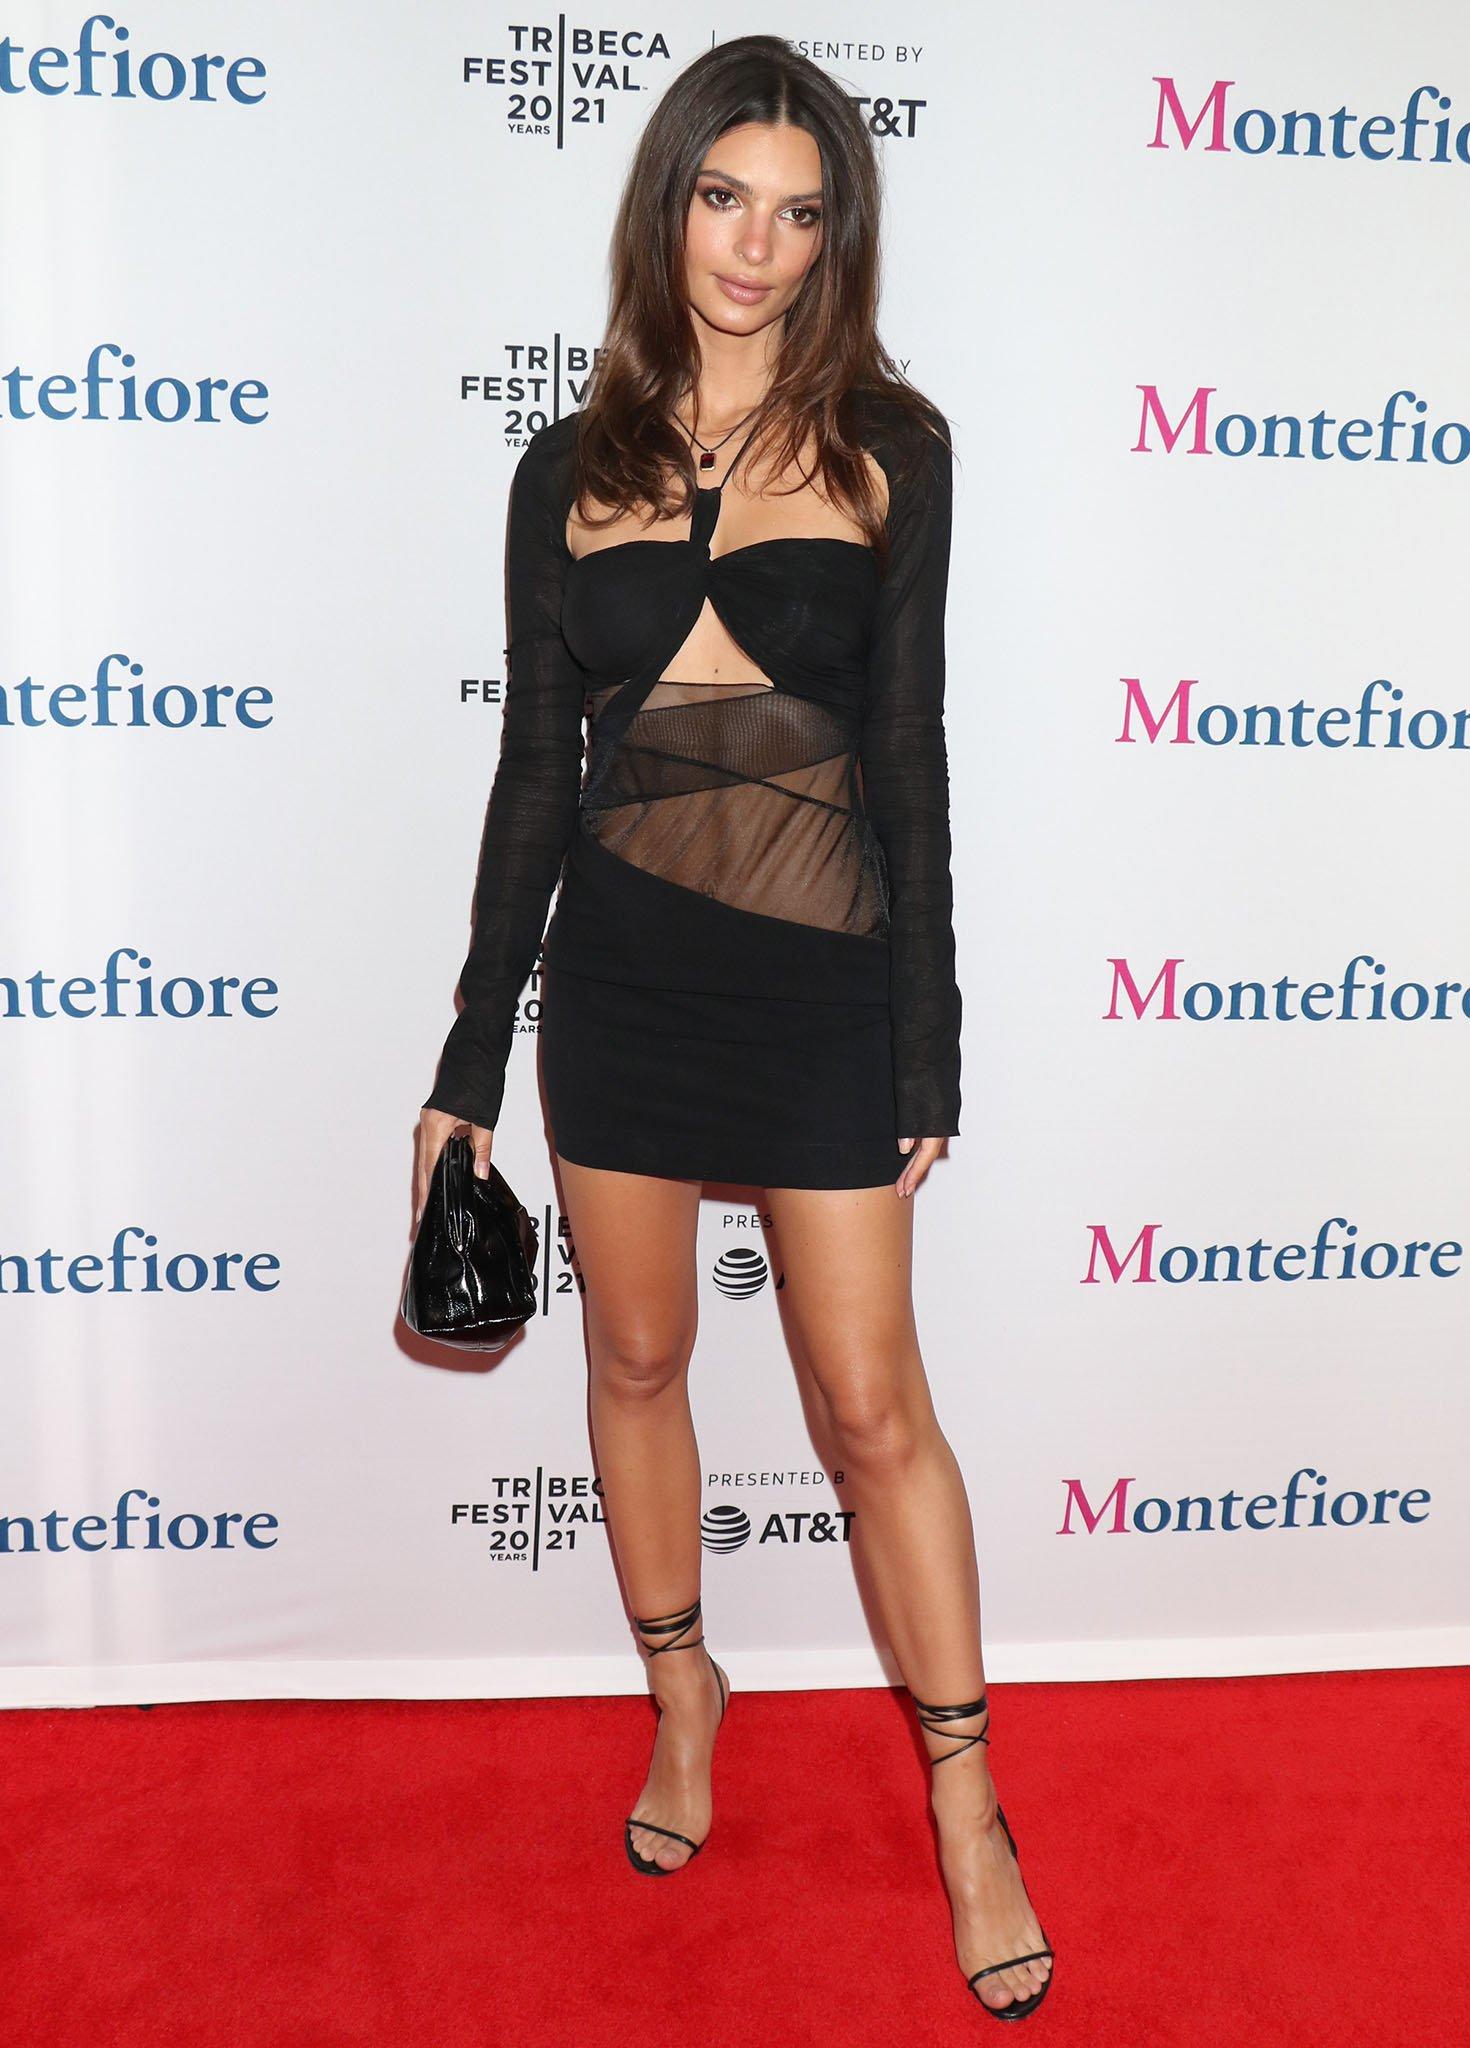 Emily Ratajkowski shows off her slim figure in a Nensi Dojaka sheer mesh mini dress